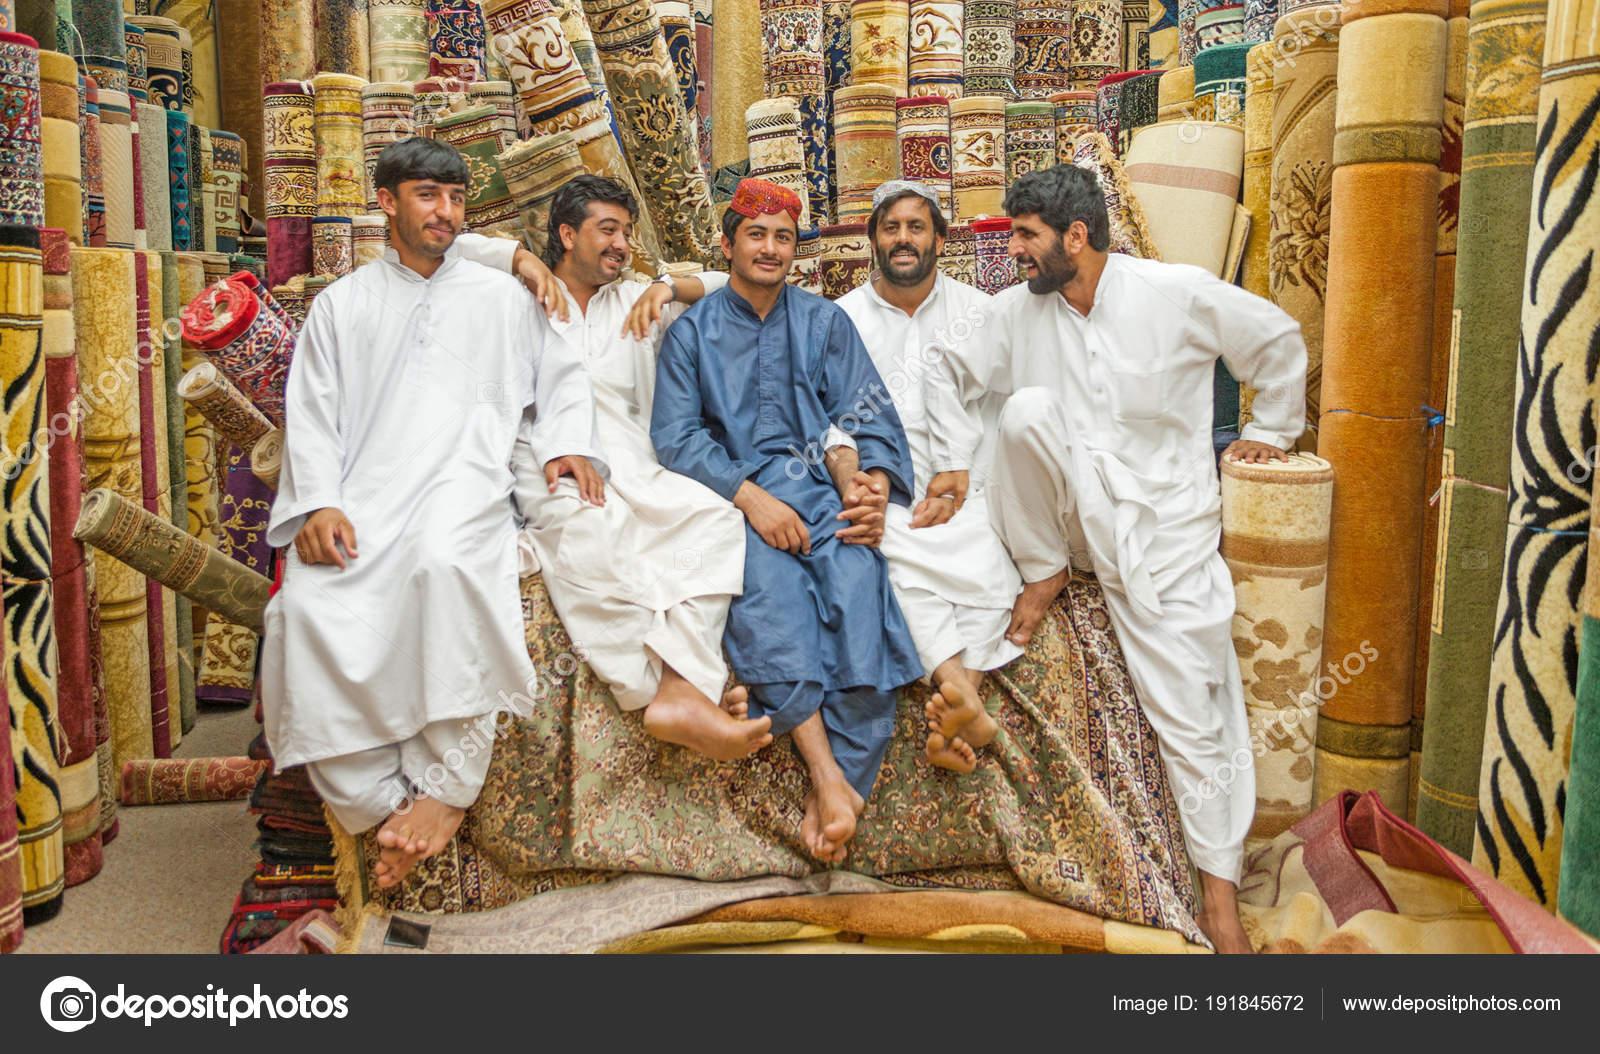 Men at the Carpet Souk in Abu Dhabi – Stock Editorial Photo